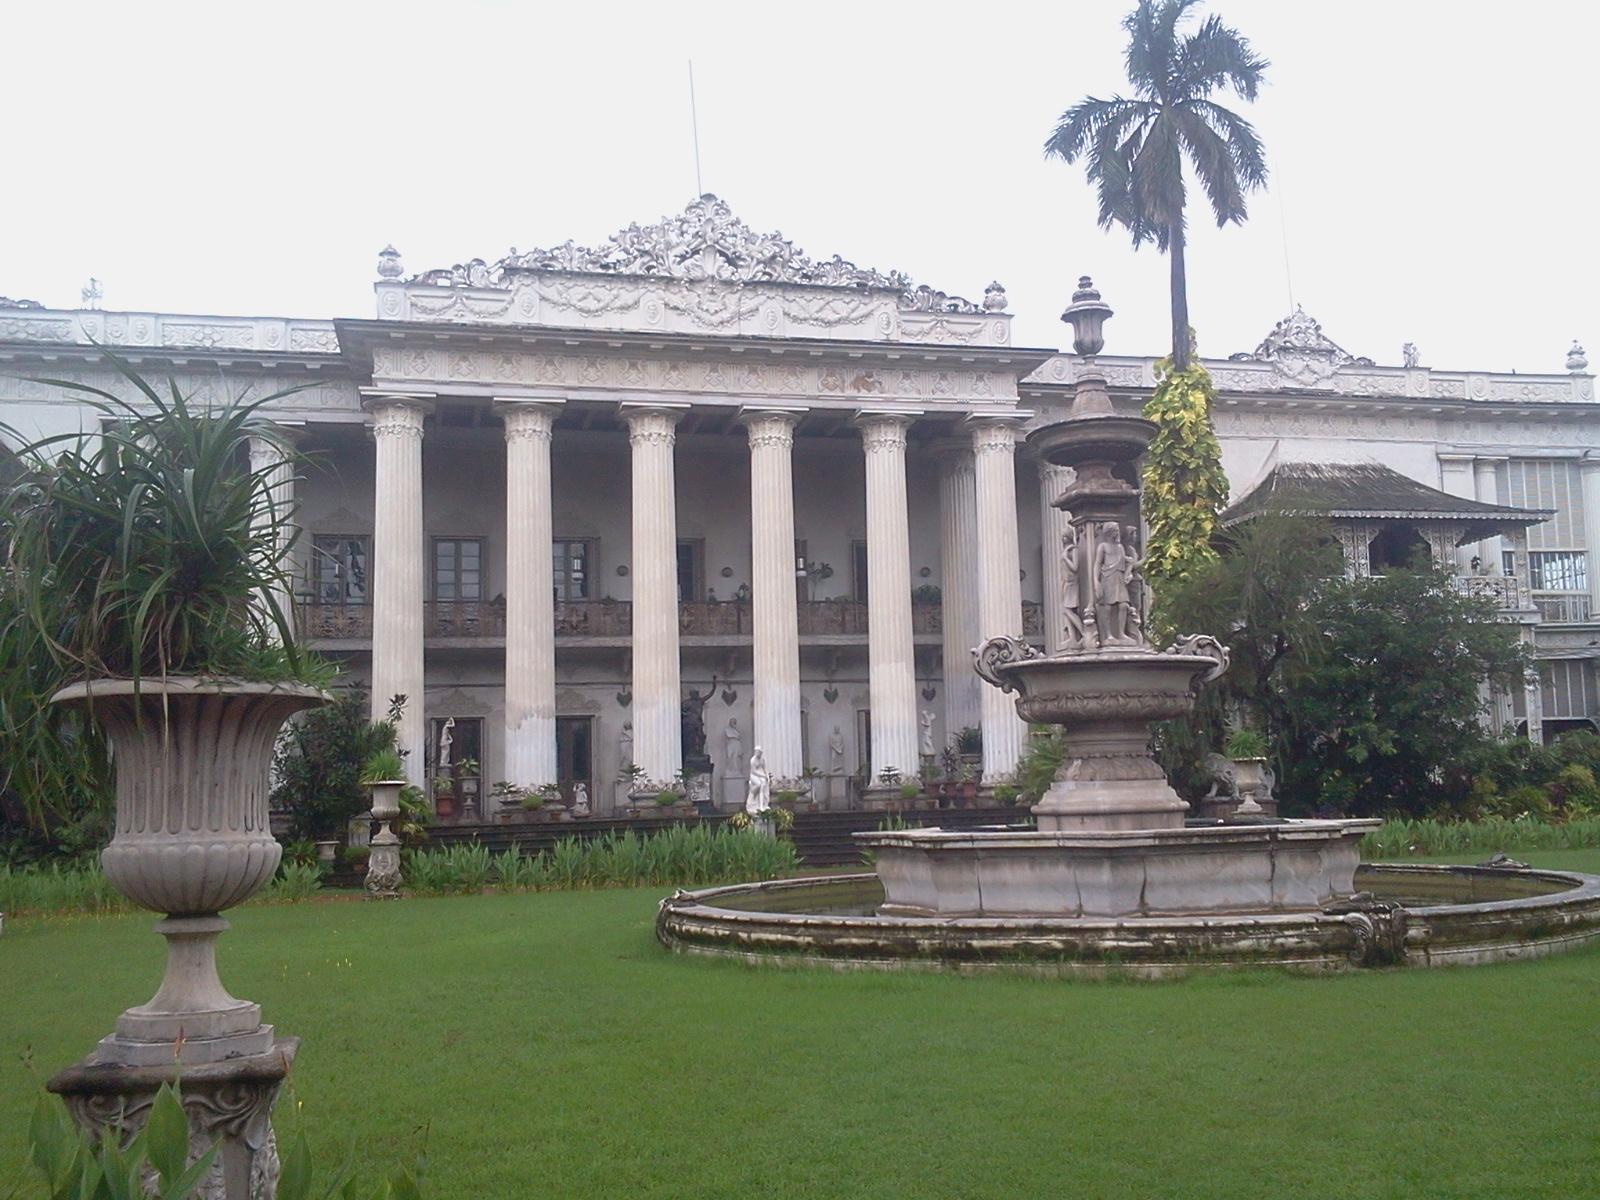 Fichier:Marble Palace,Kolkata,West Bengal.jpg — Wikipédia